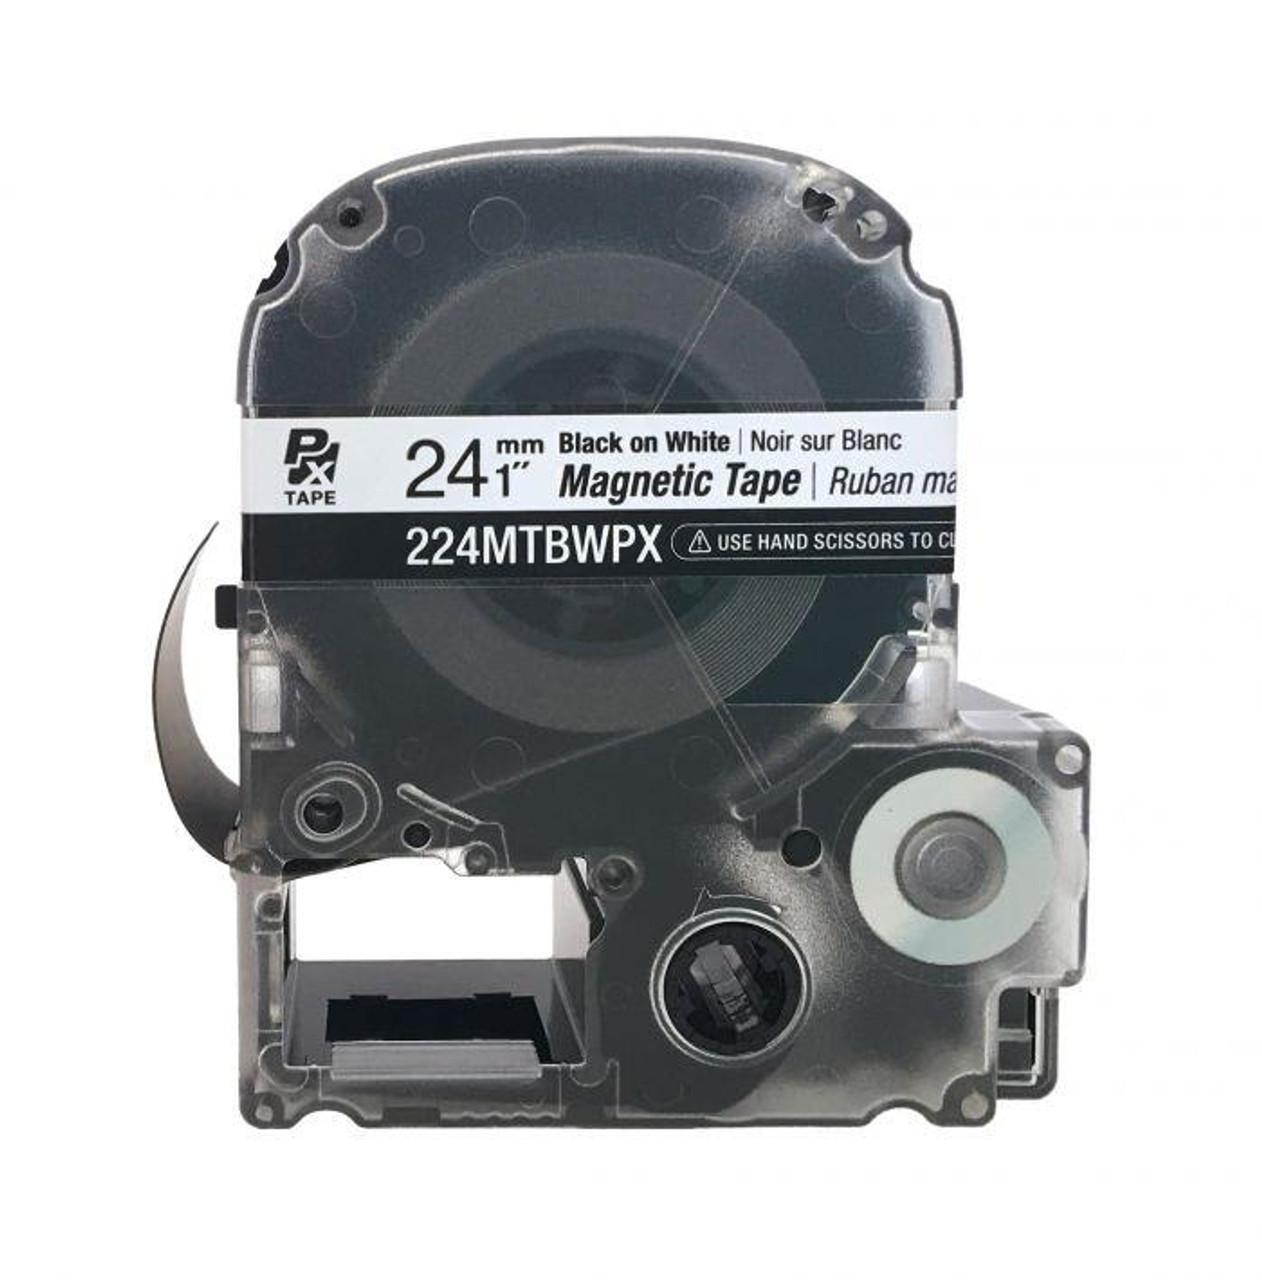 "Epson/K-SUN 224MTBWPX-4.9 BLK ON WHT PX Label Tape 1""/24MM Magnet Tape"